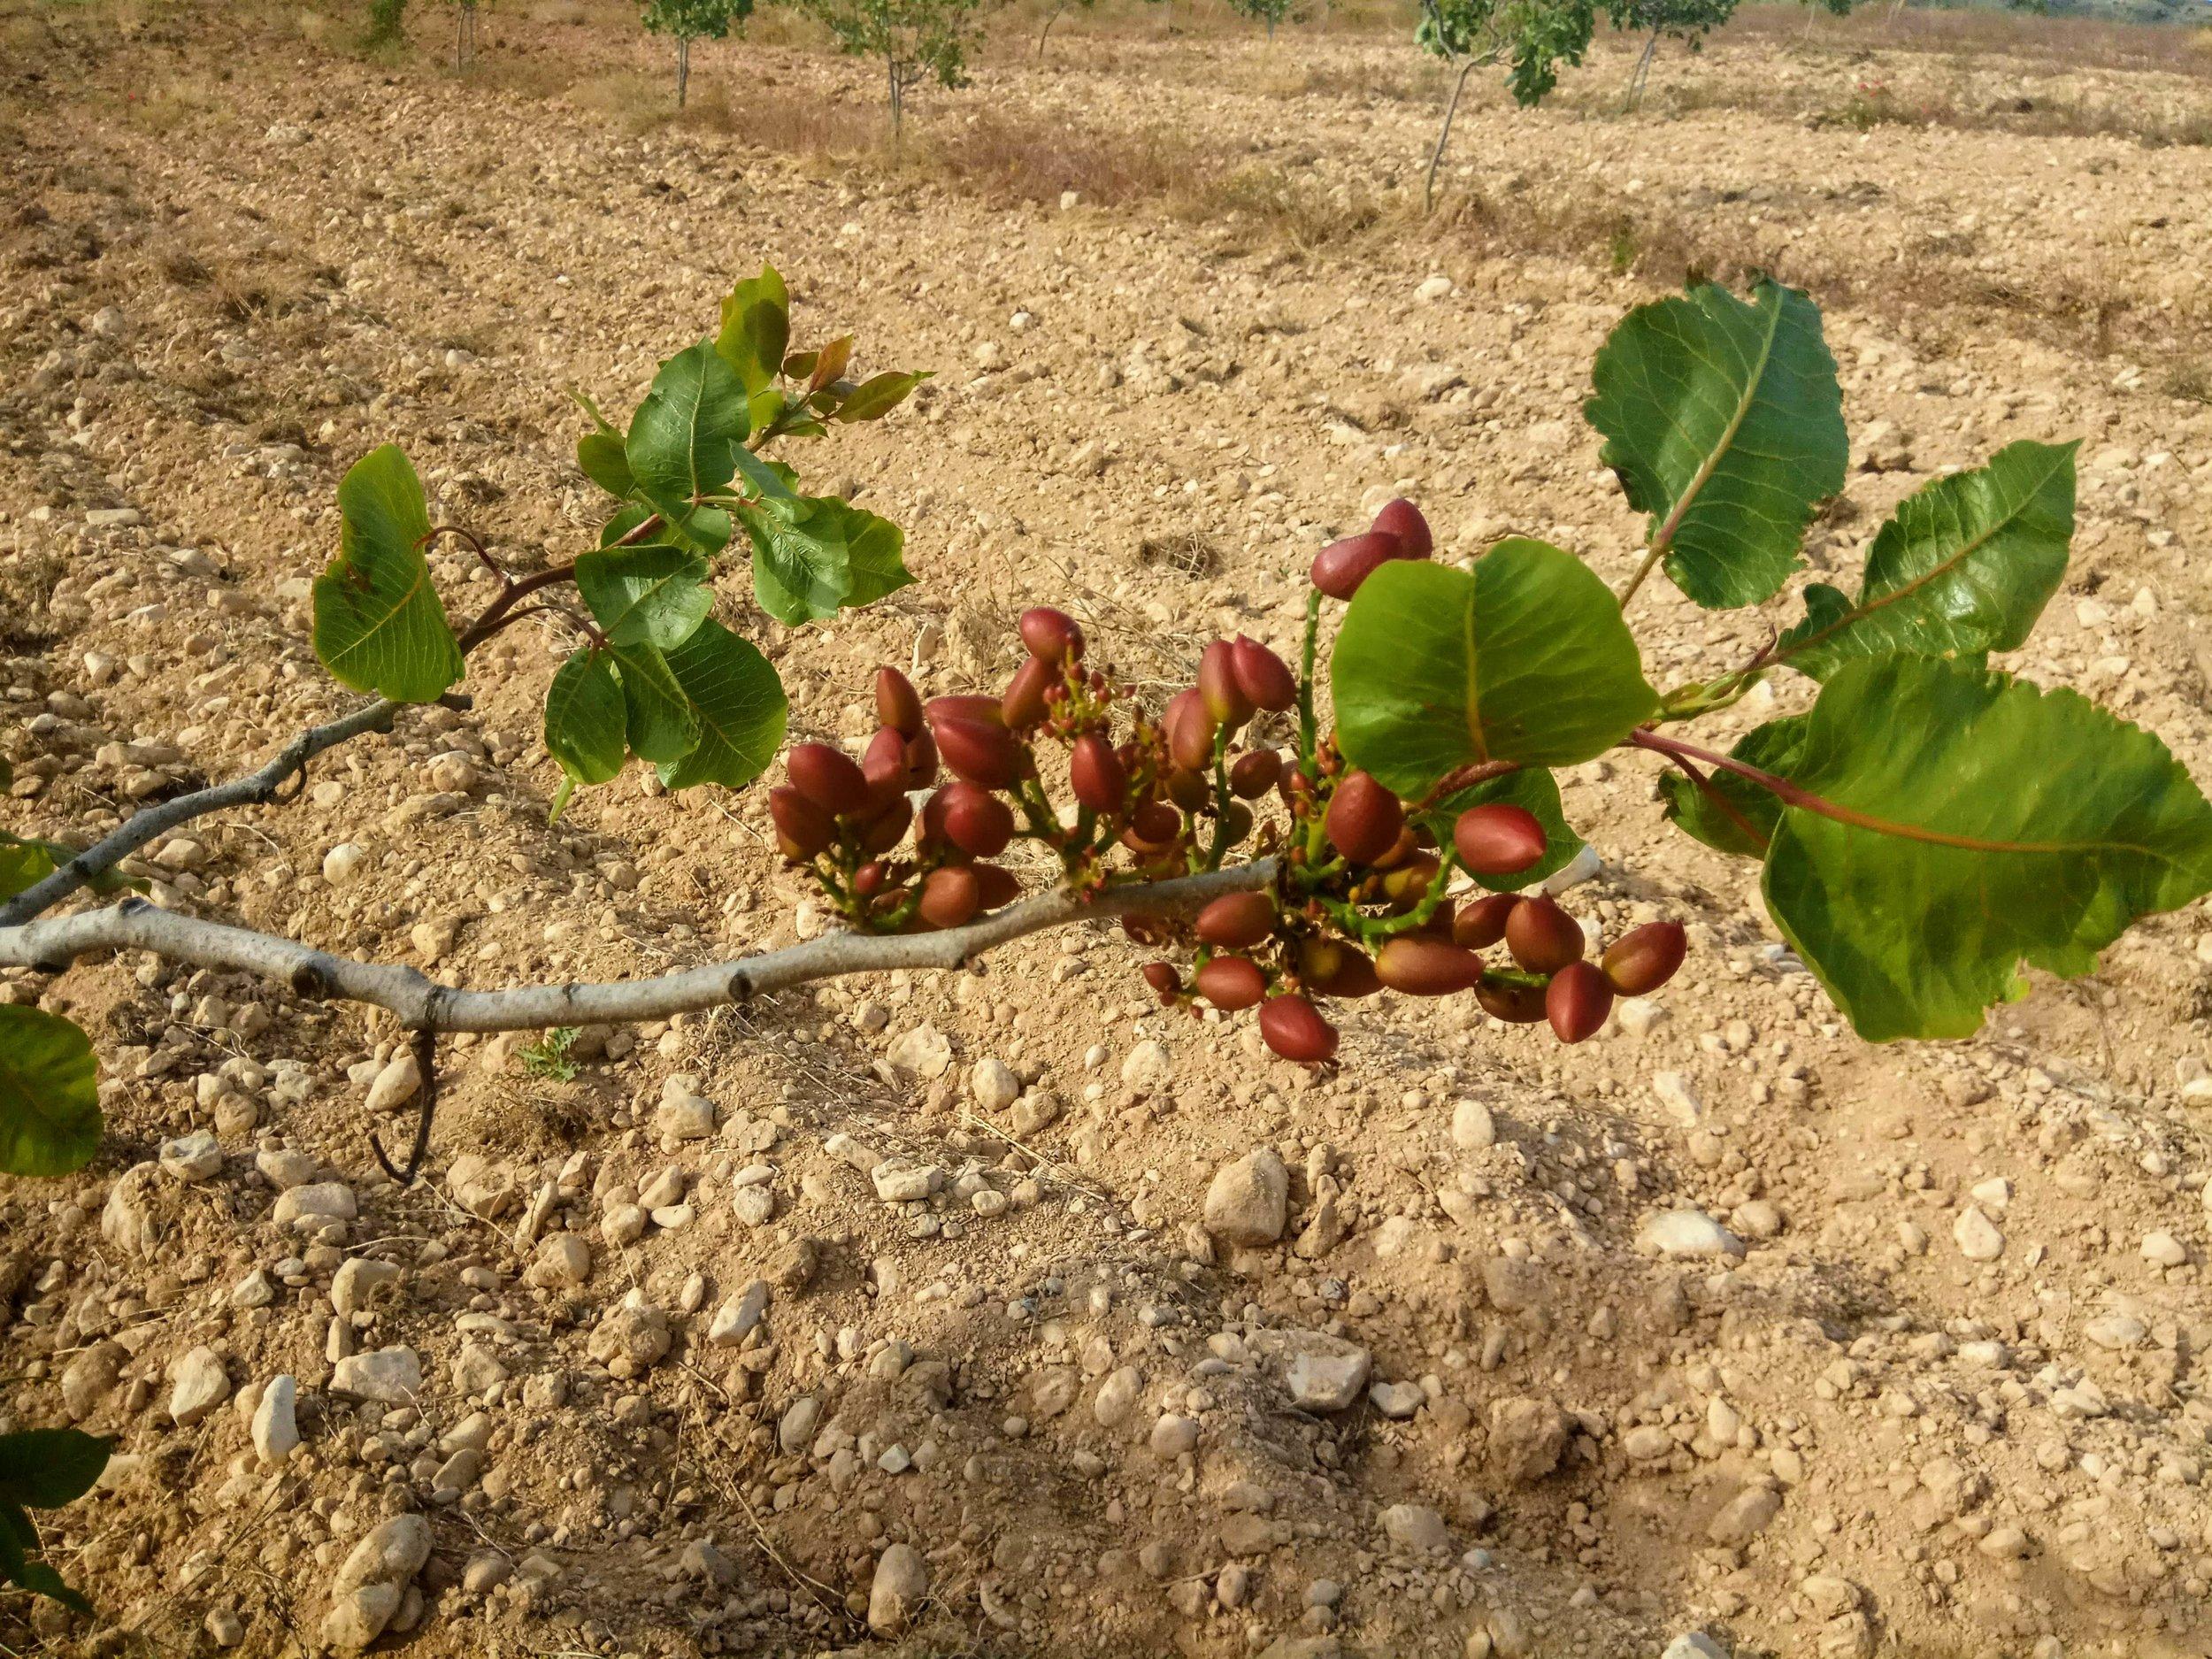 Pistachio starting to ripe, May 2019